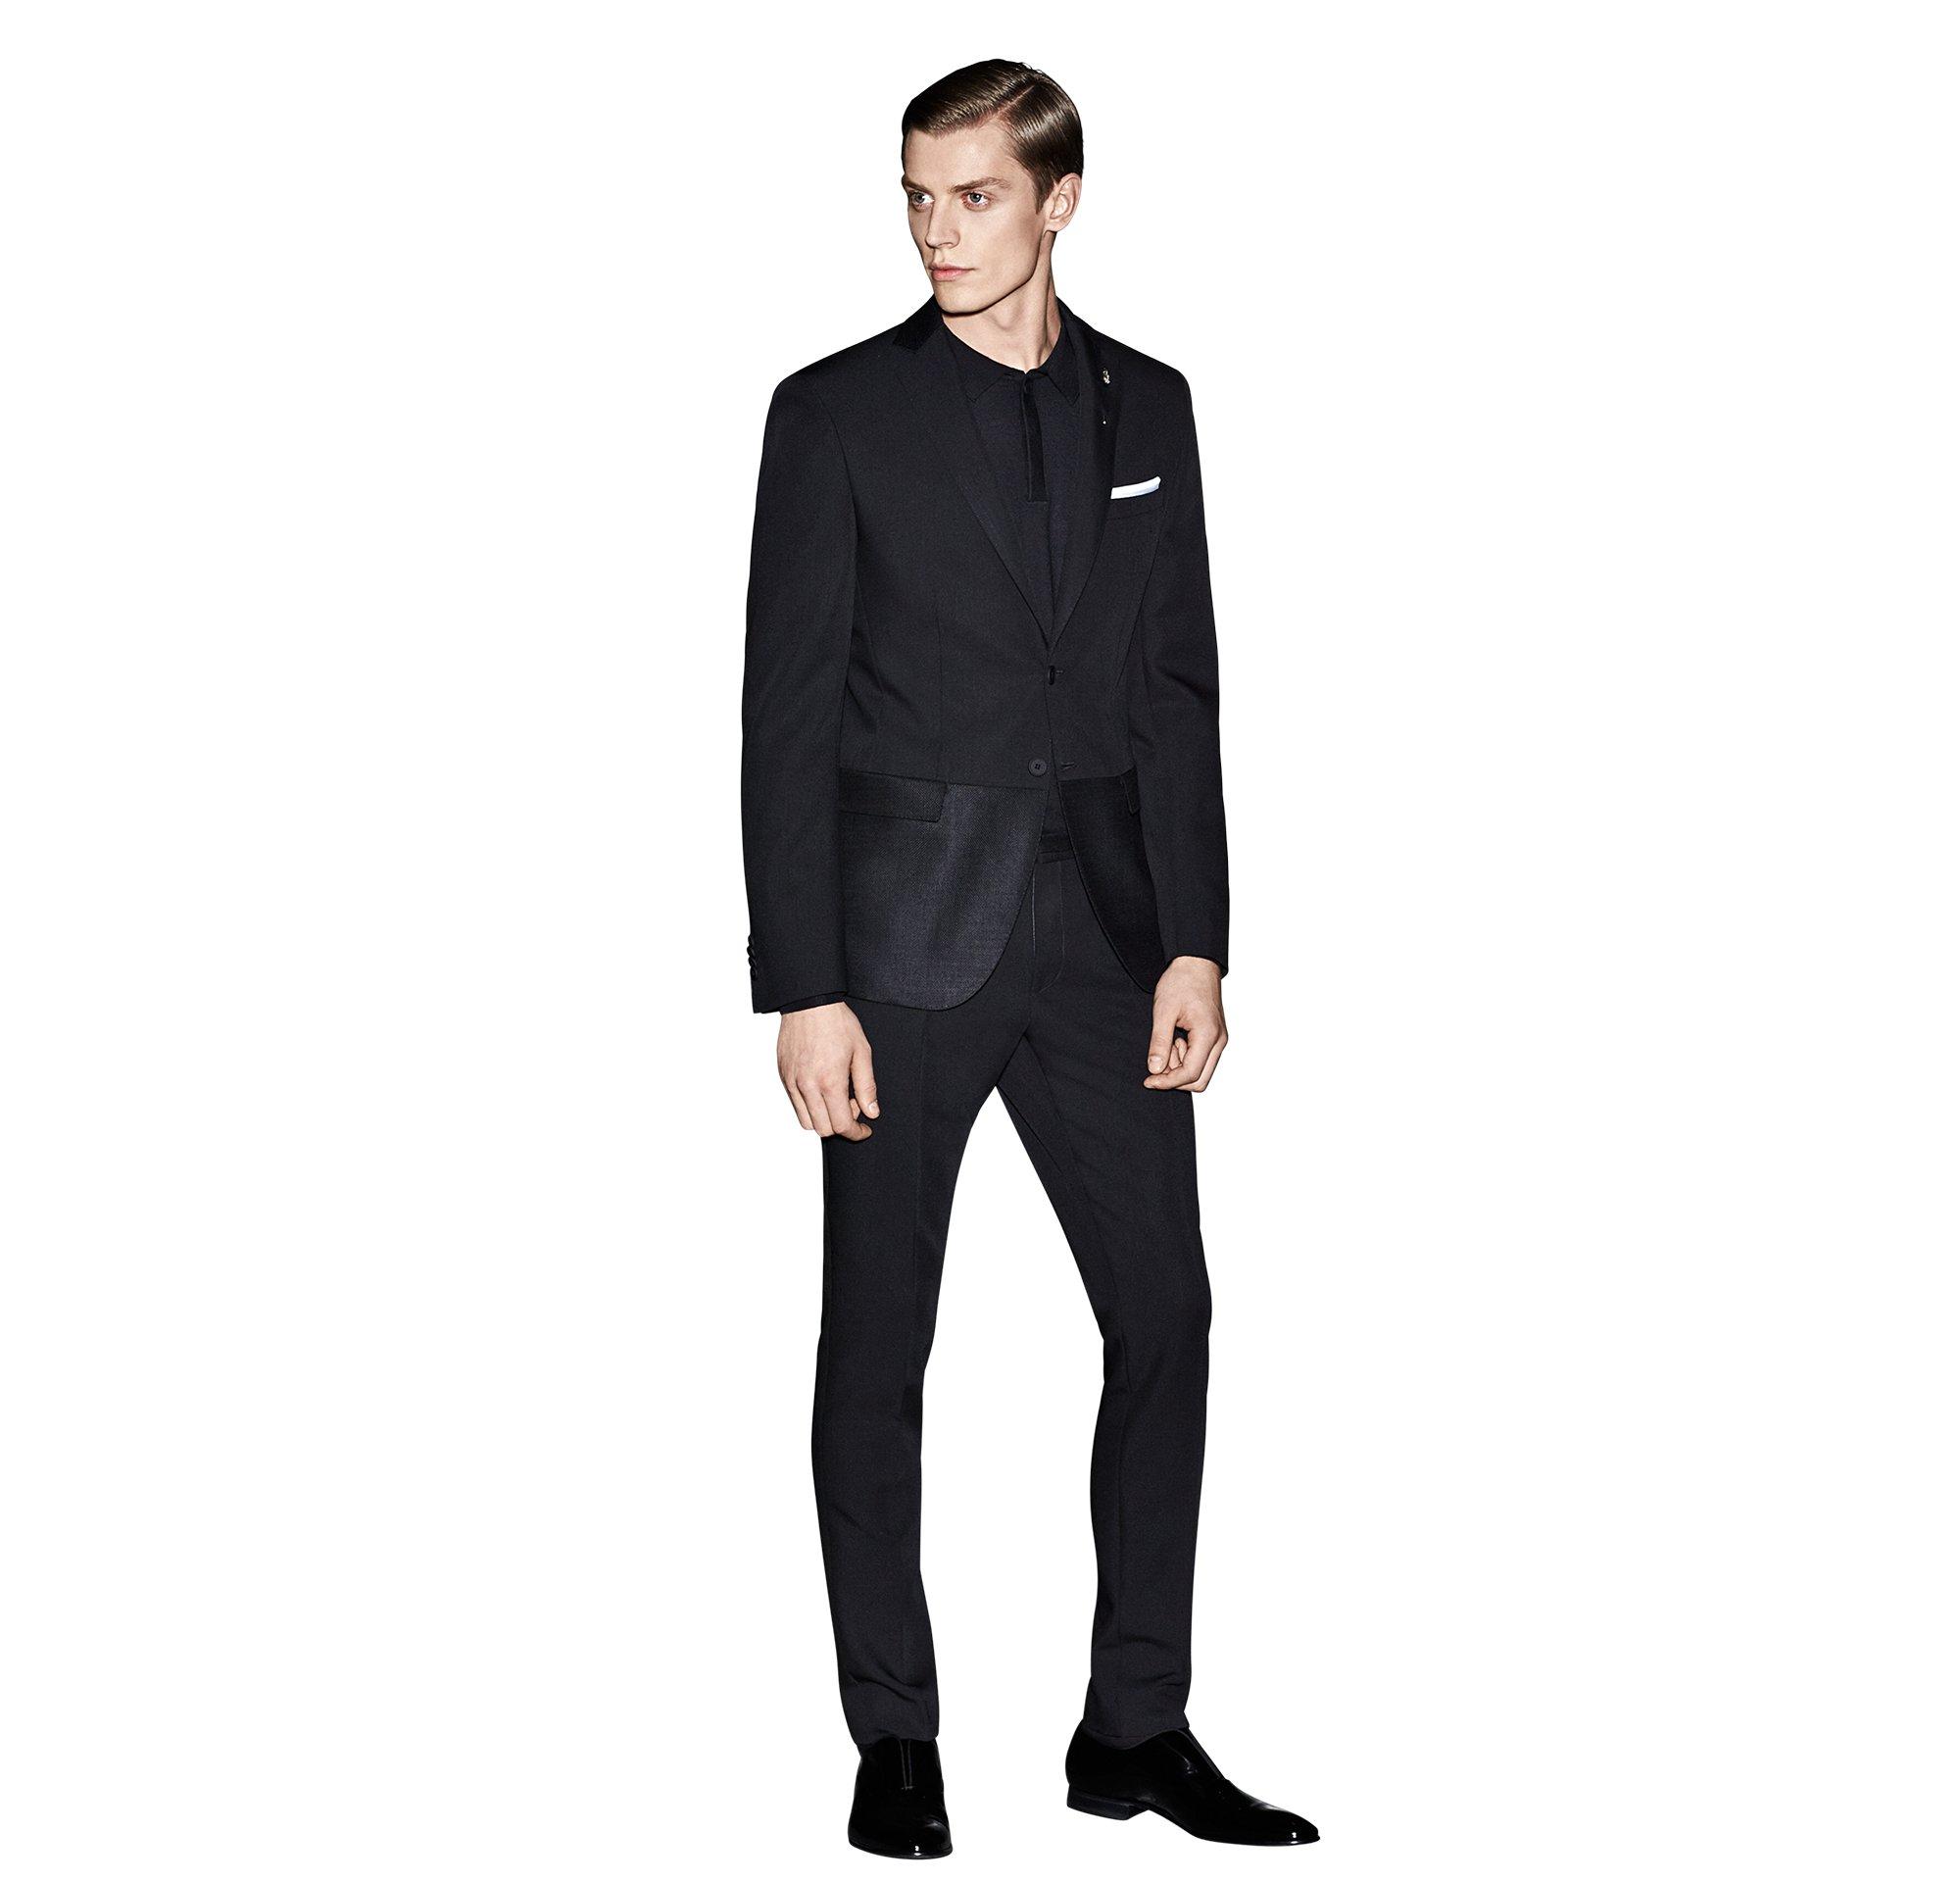 Zwart kostuum, zwart overhemd van BOSS